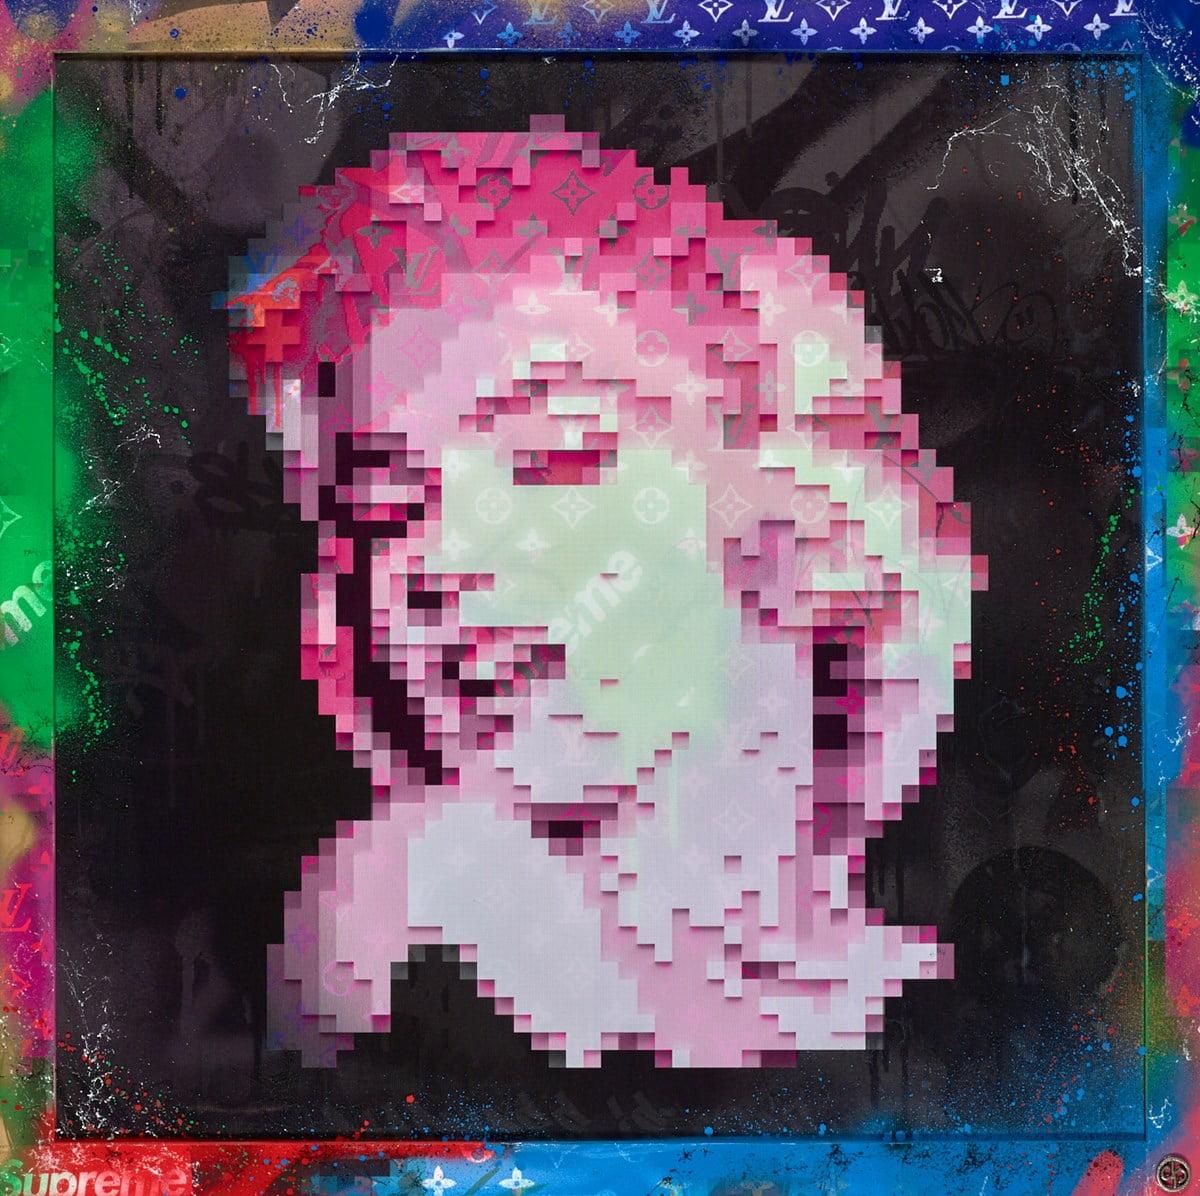 Miss Marilyn Monroe ~ Dan Pearce